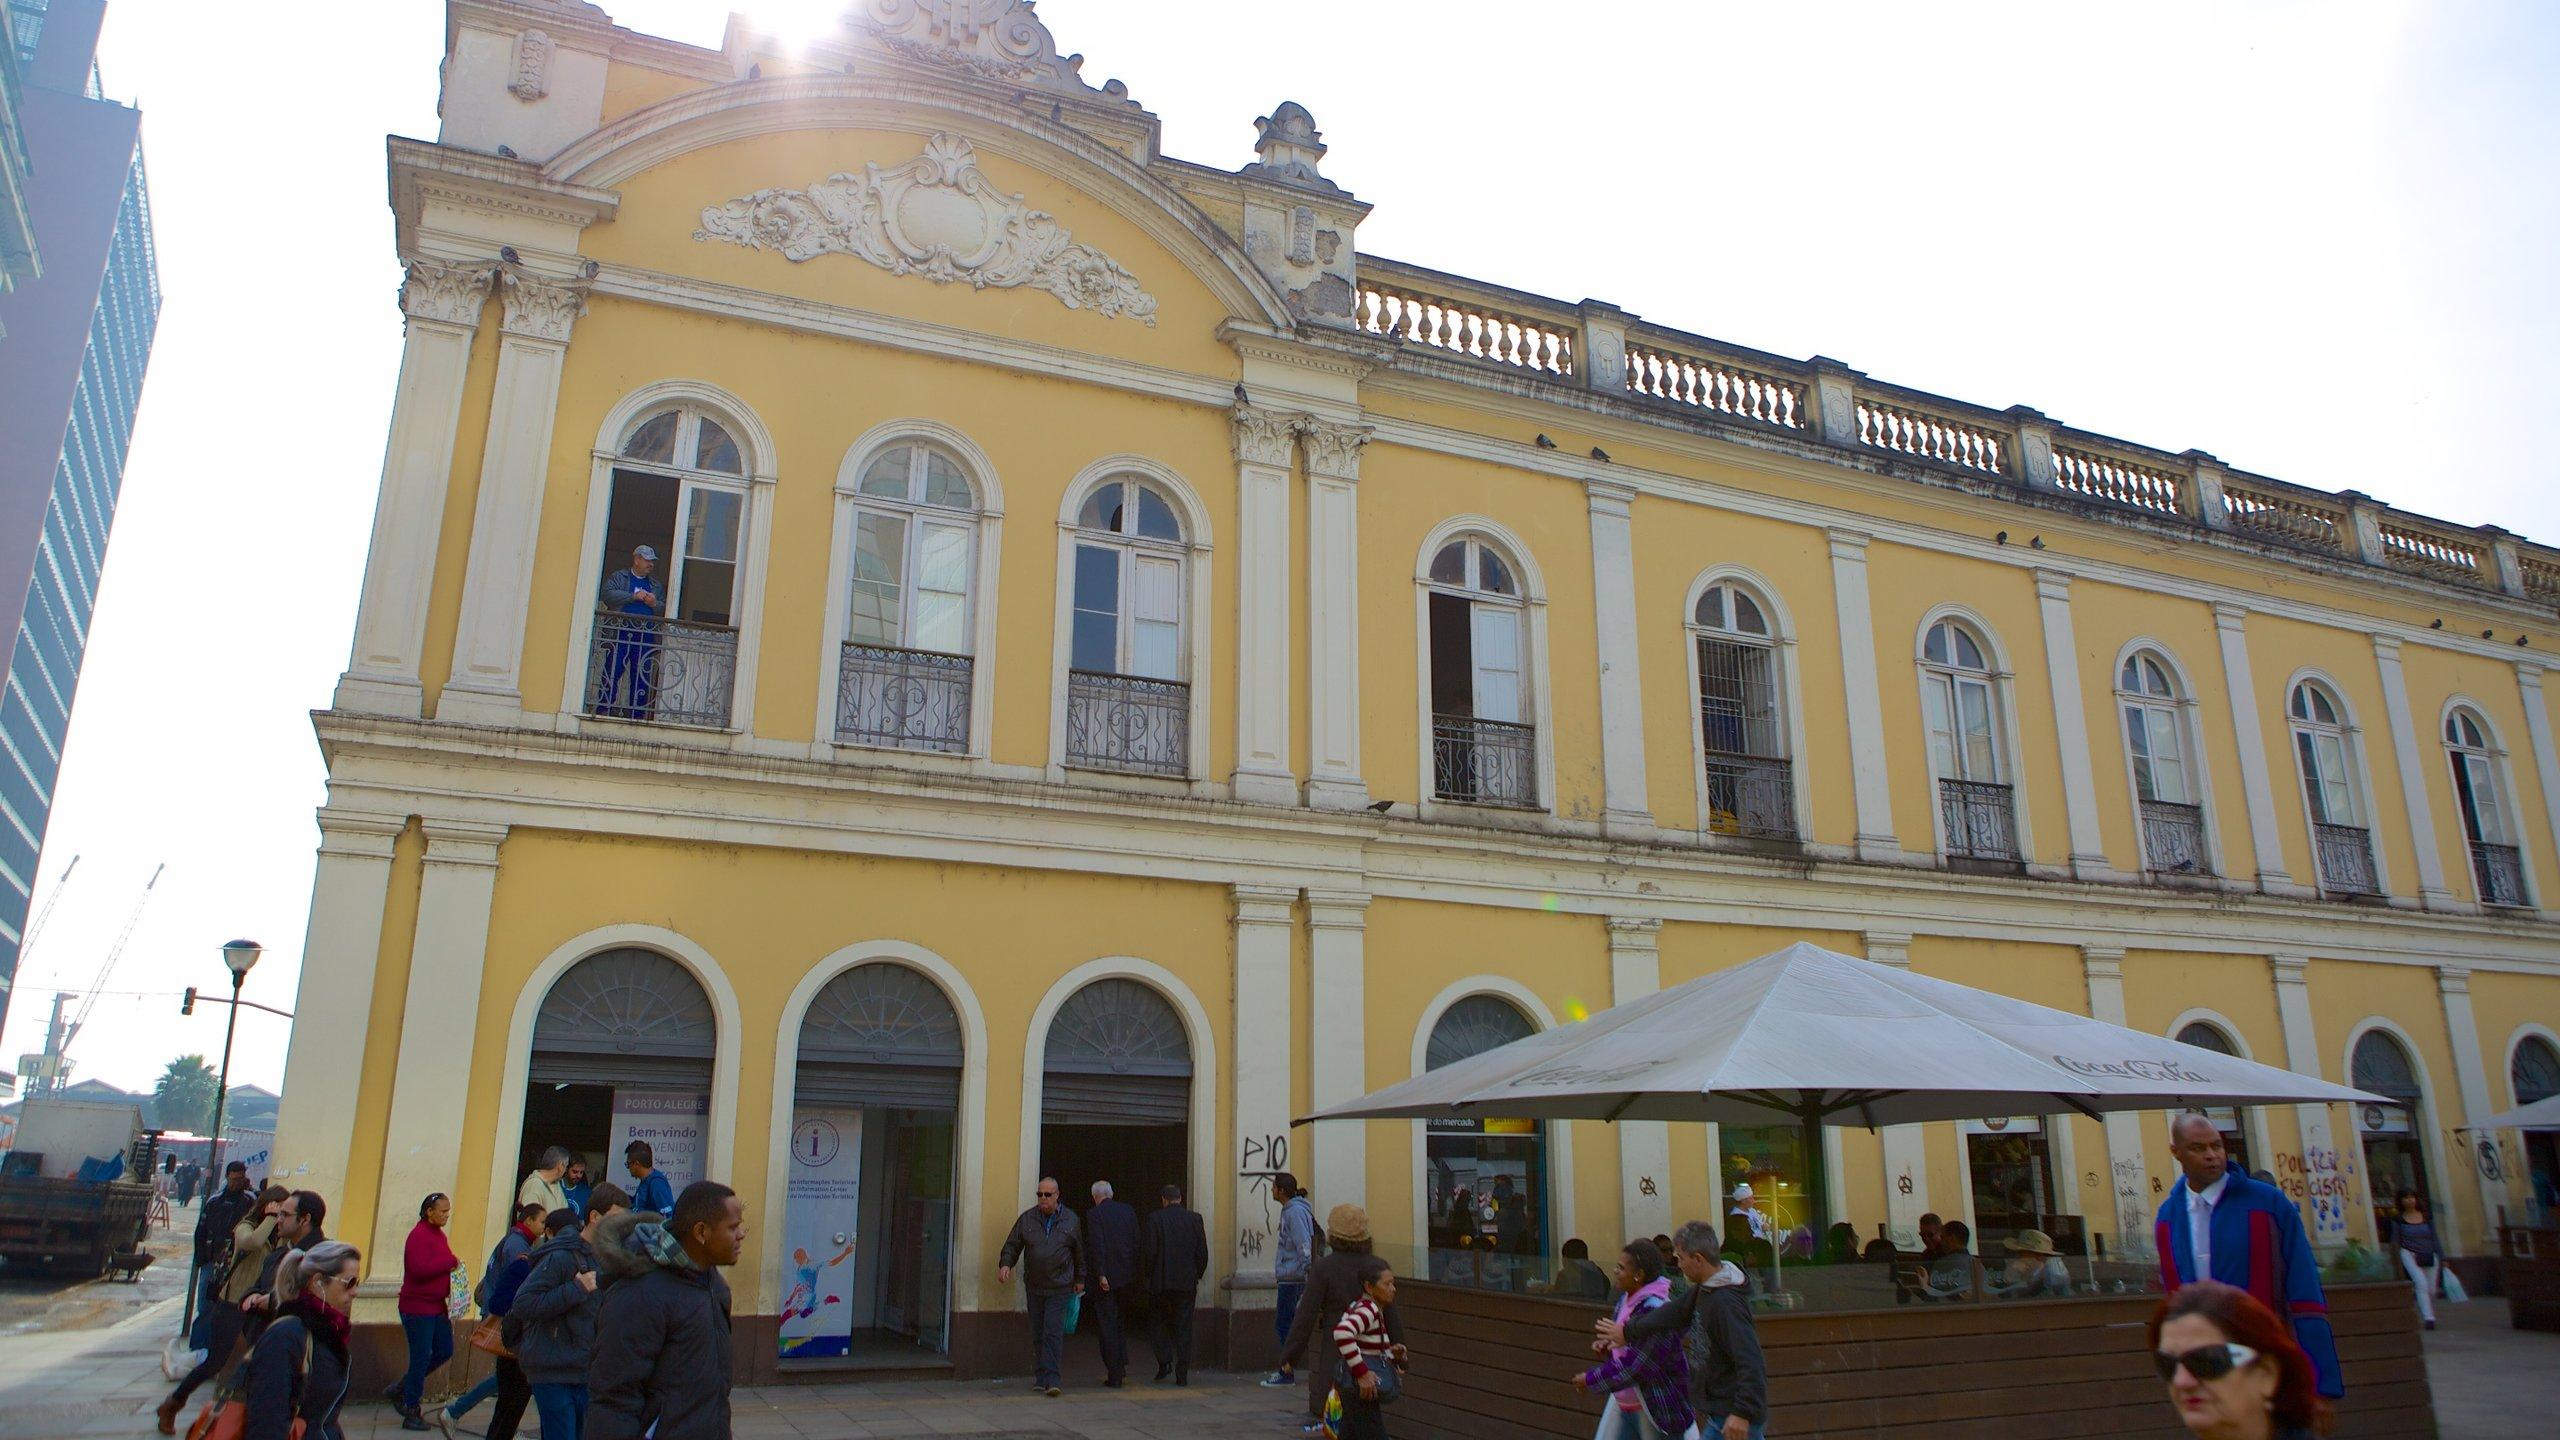 Florianopolis Centro, Florianopolis, Santa Catarina State, Brazil